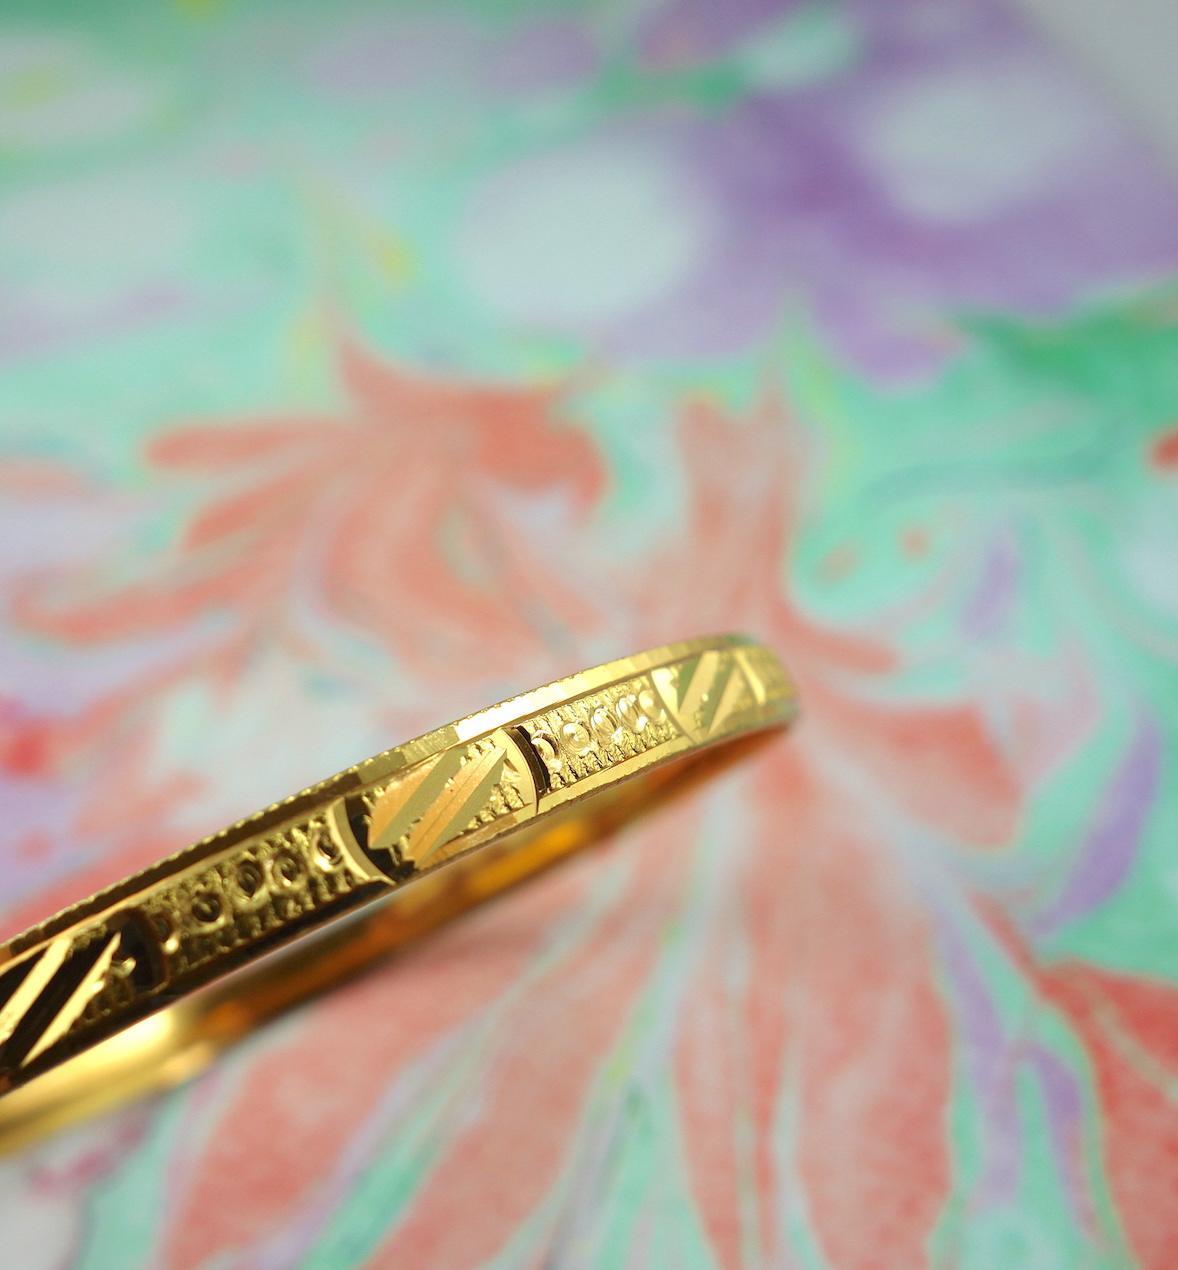 bracelet-oriane-roulotte-laiton-dore-ouvrage-martele-facon-vintage-retro-voyageur-photo-macro